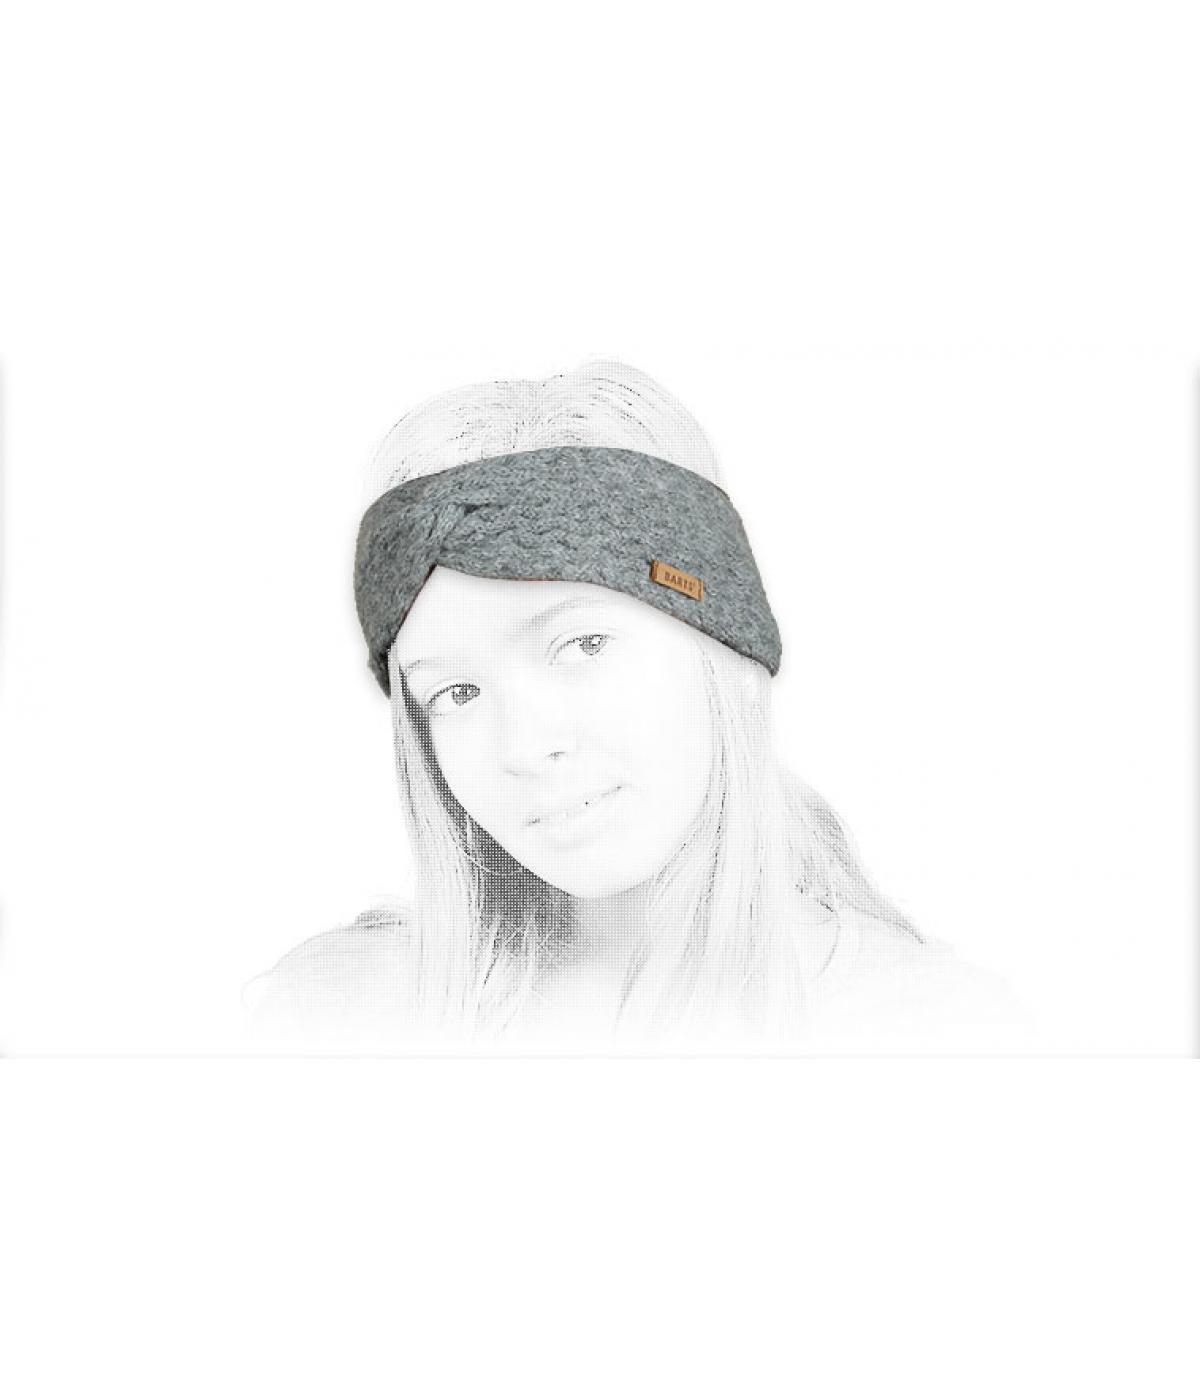 Details Kids Rozamond Headband heather grey - afbeeling 4